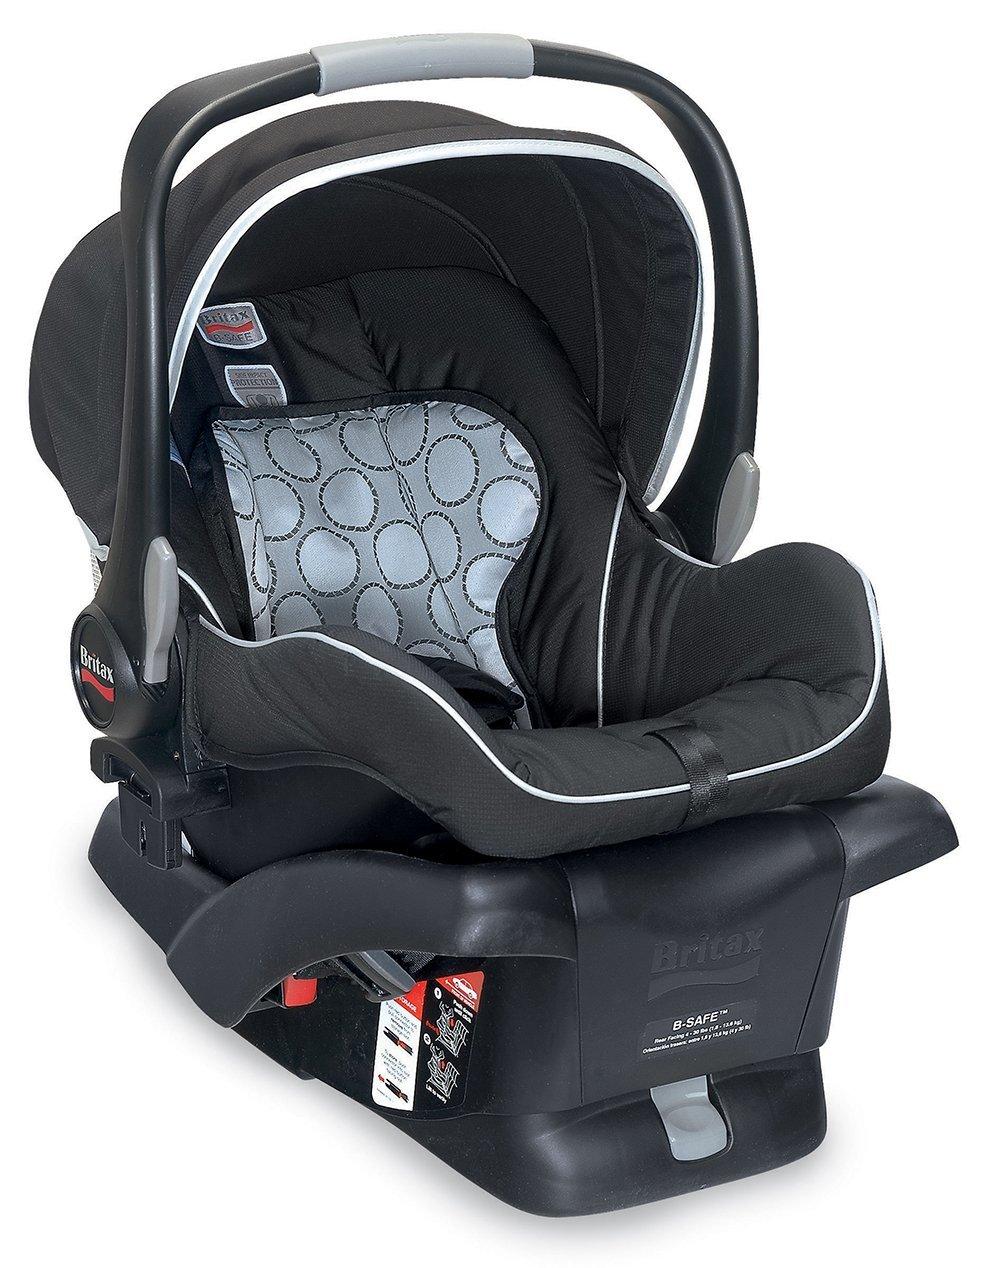 Britax B-Safe Infant Car Seat